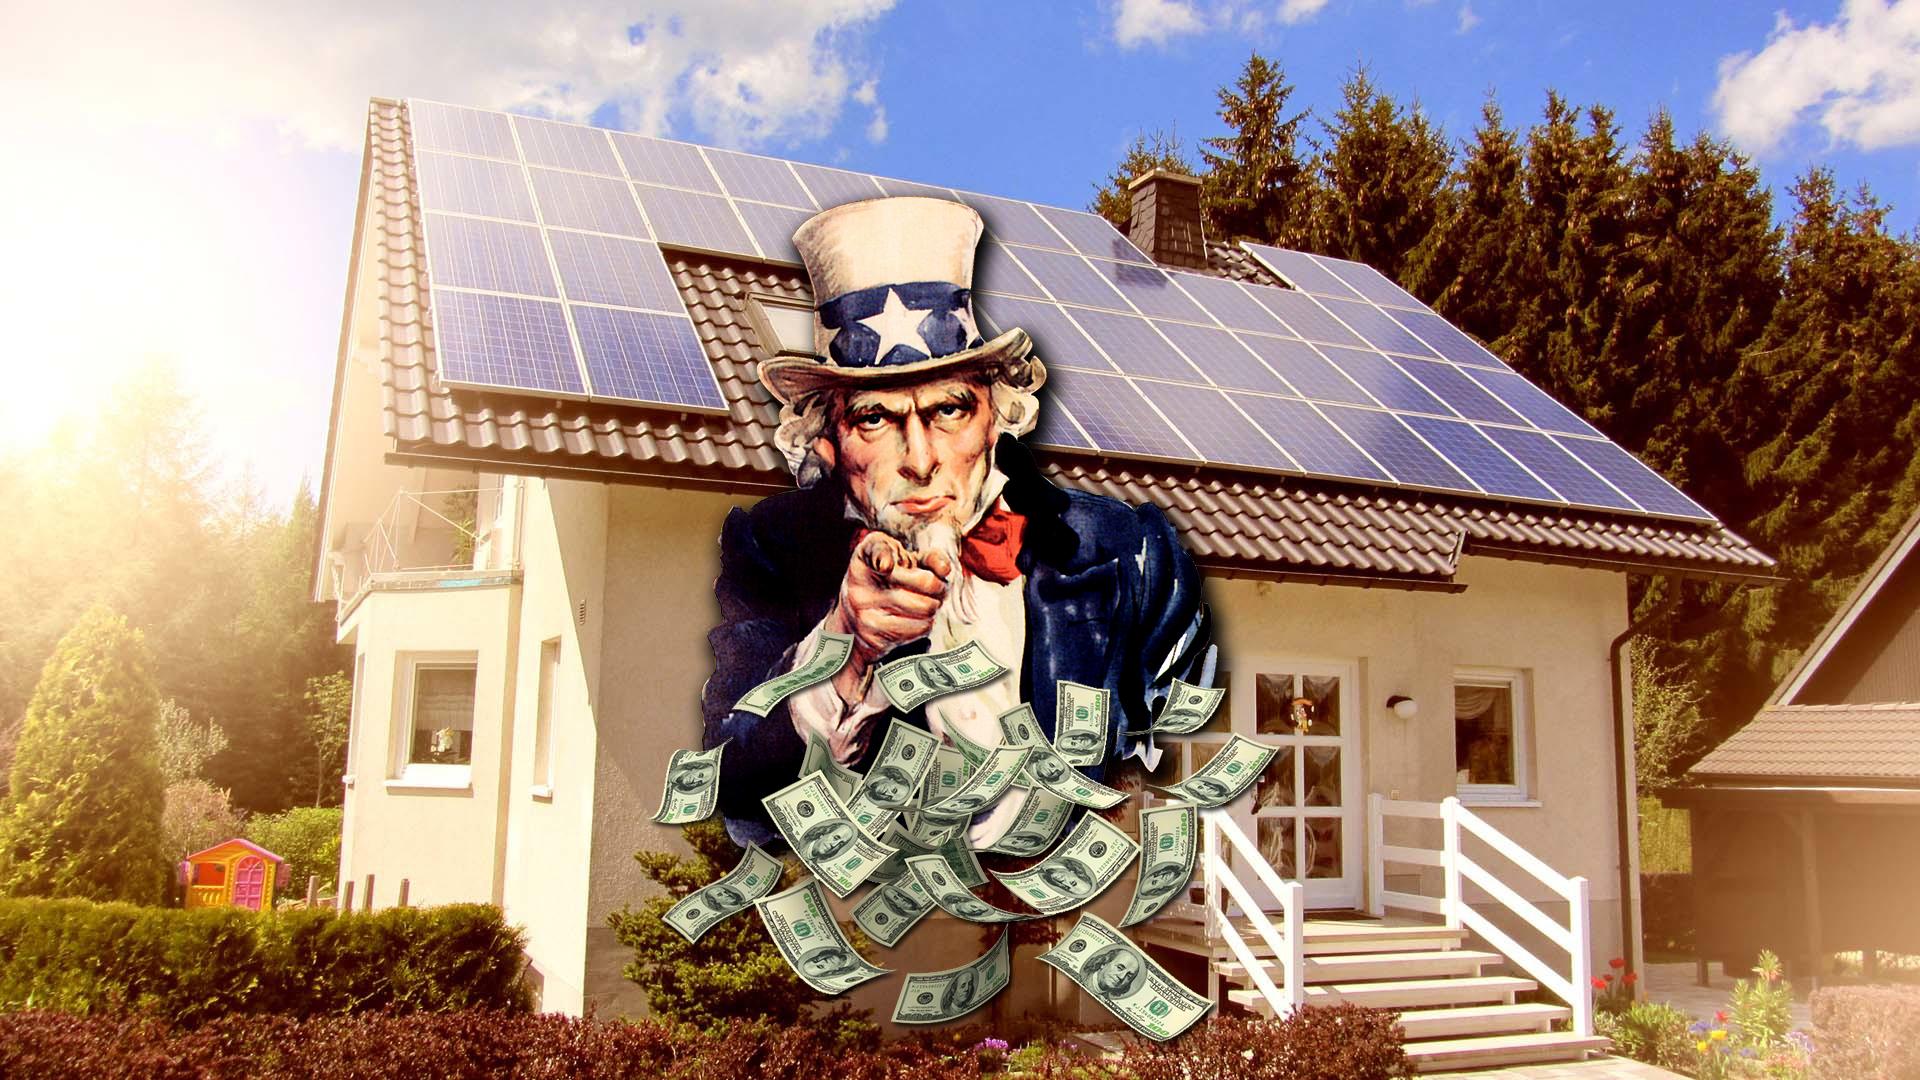 Solar panels 100% free – saving money or environmental protection?